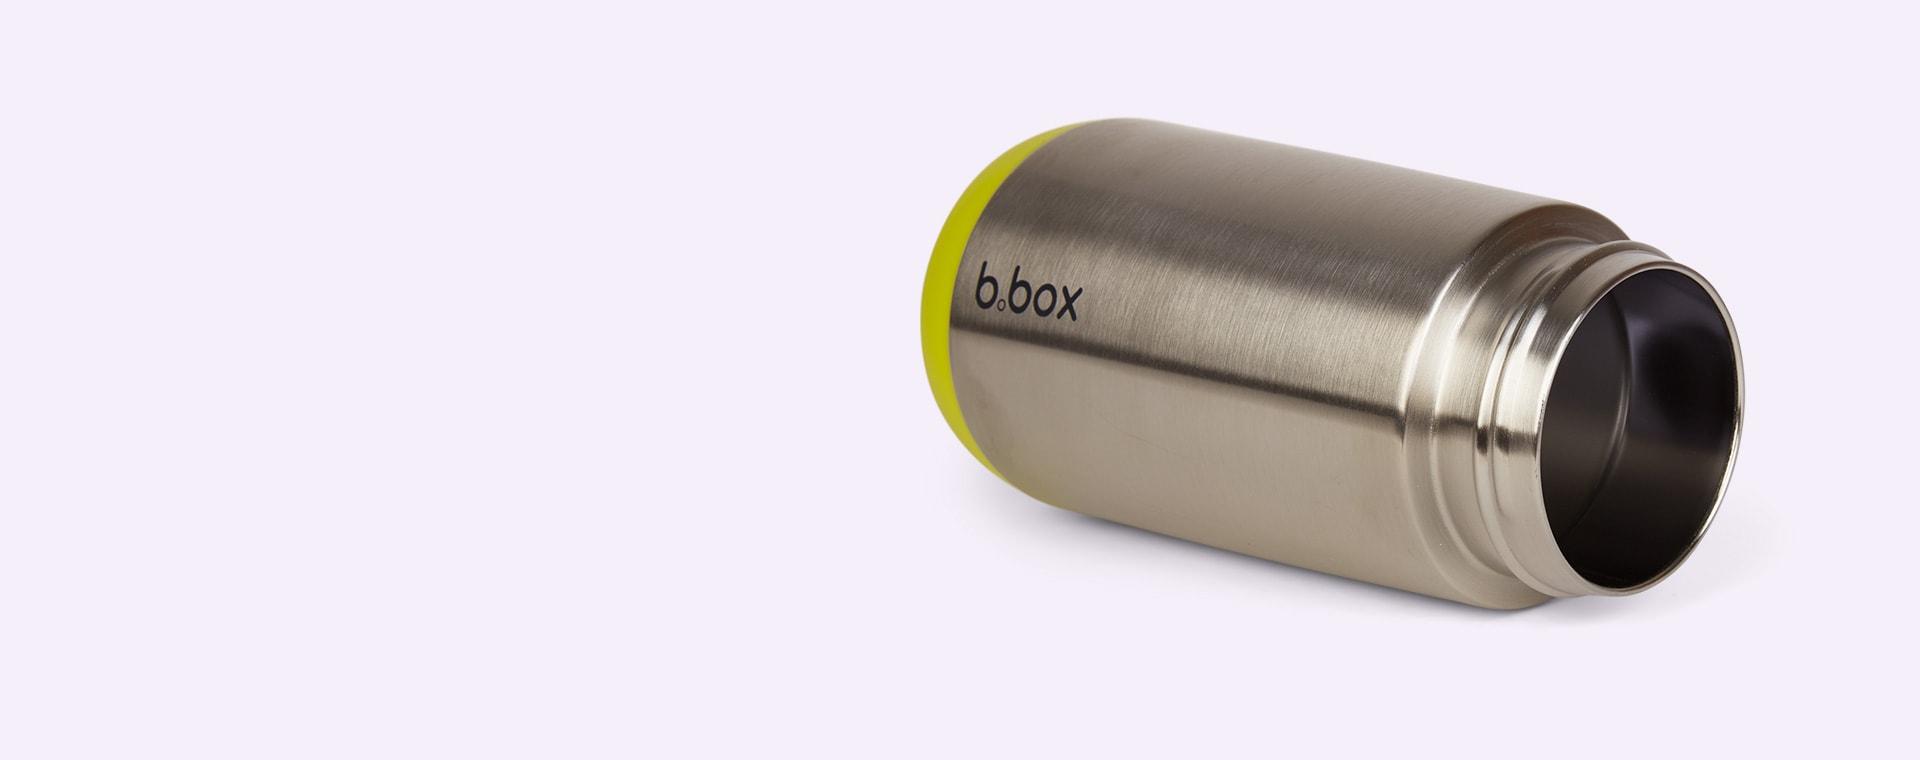 Passion Splash b.box Insulated Drink Bottle